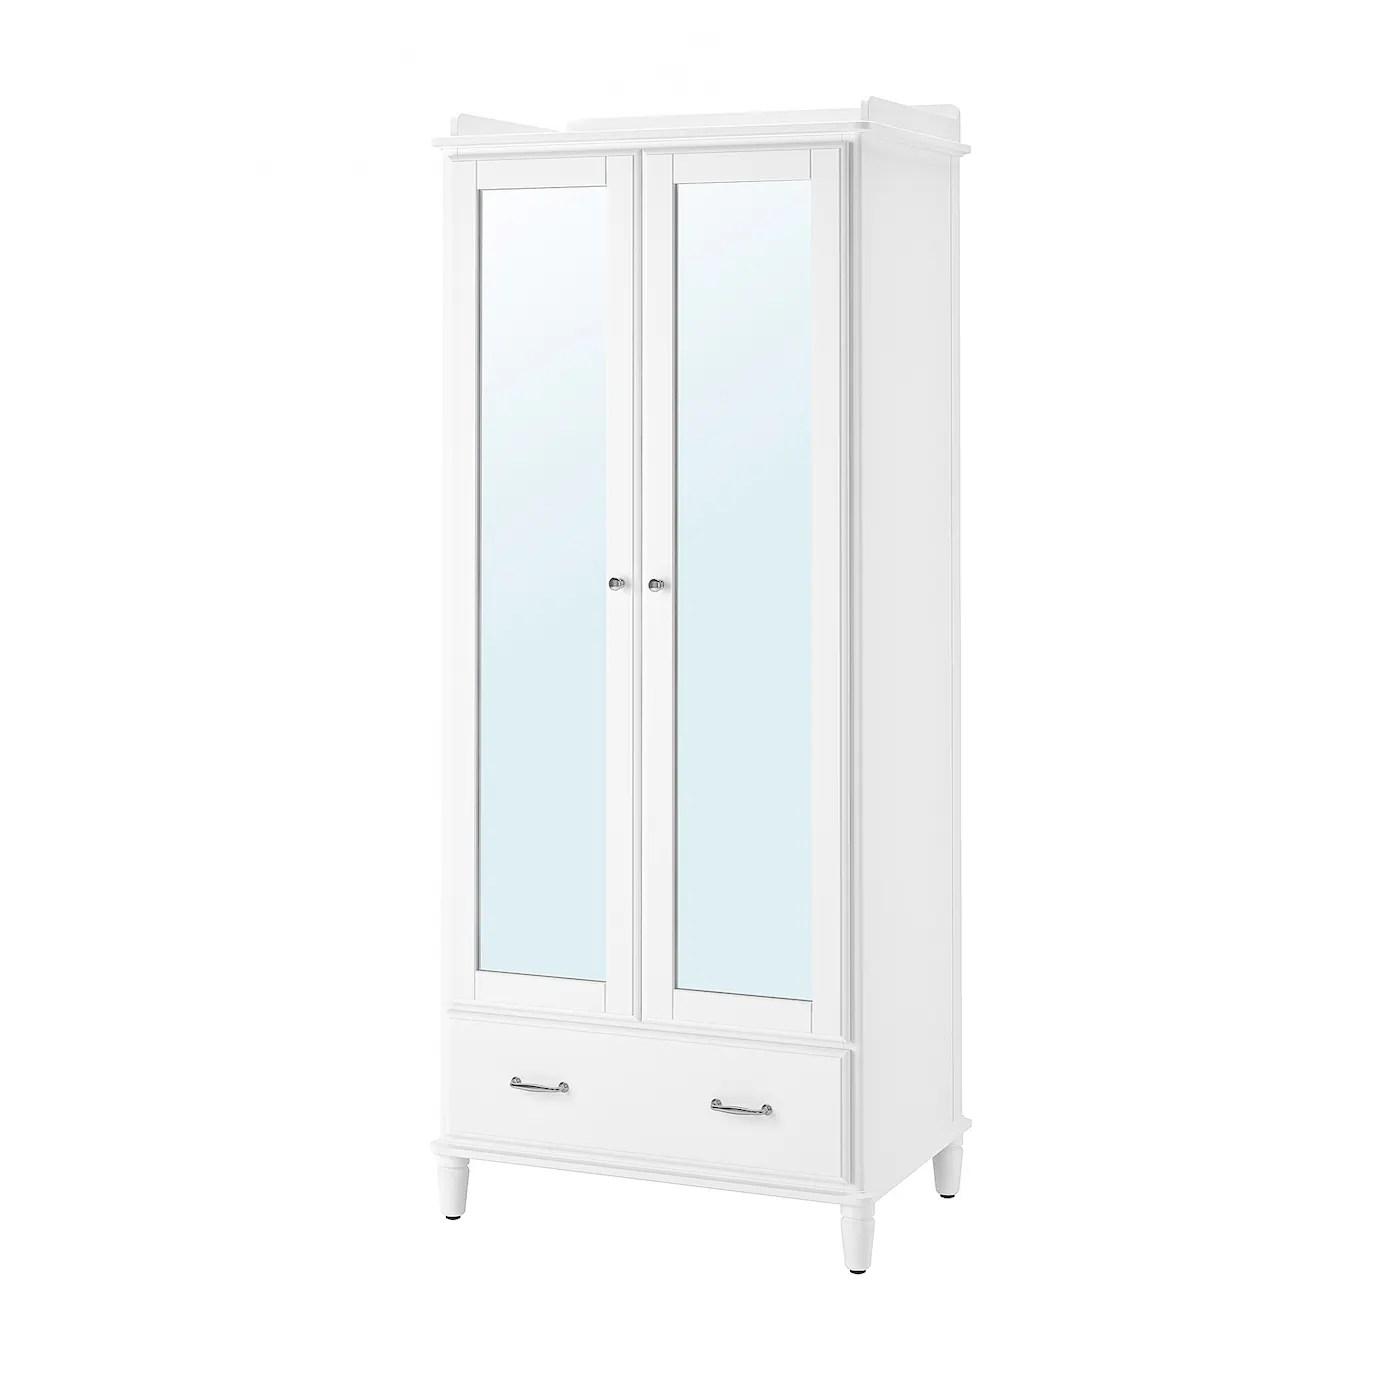 Tyssedal Armoire Blanc Miroir 88x58x208 Cm Ikea